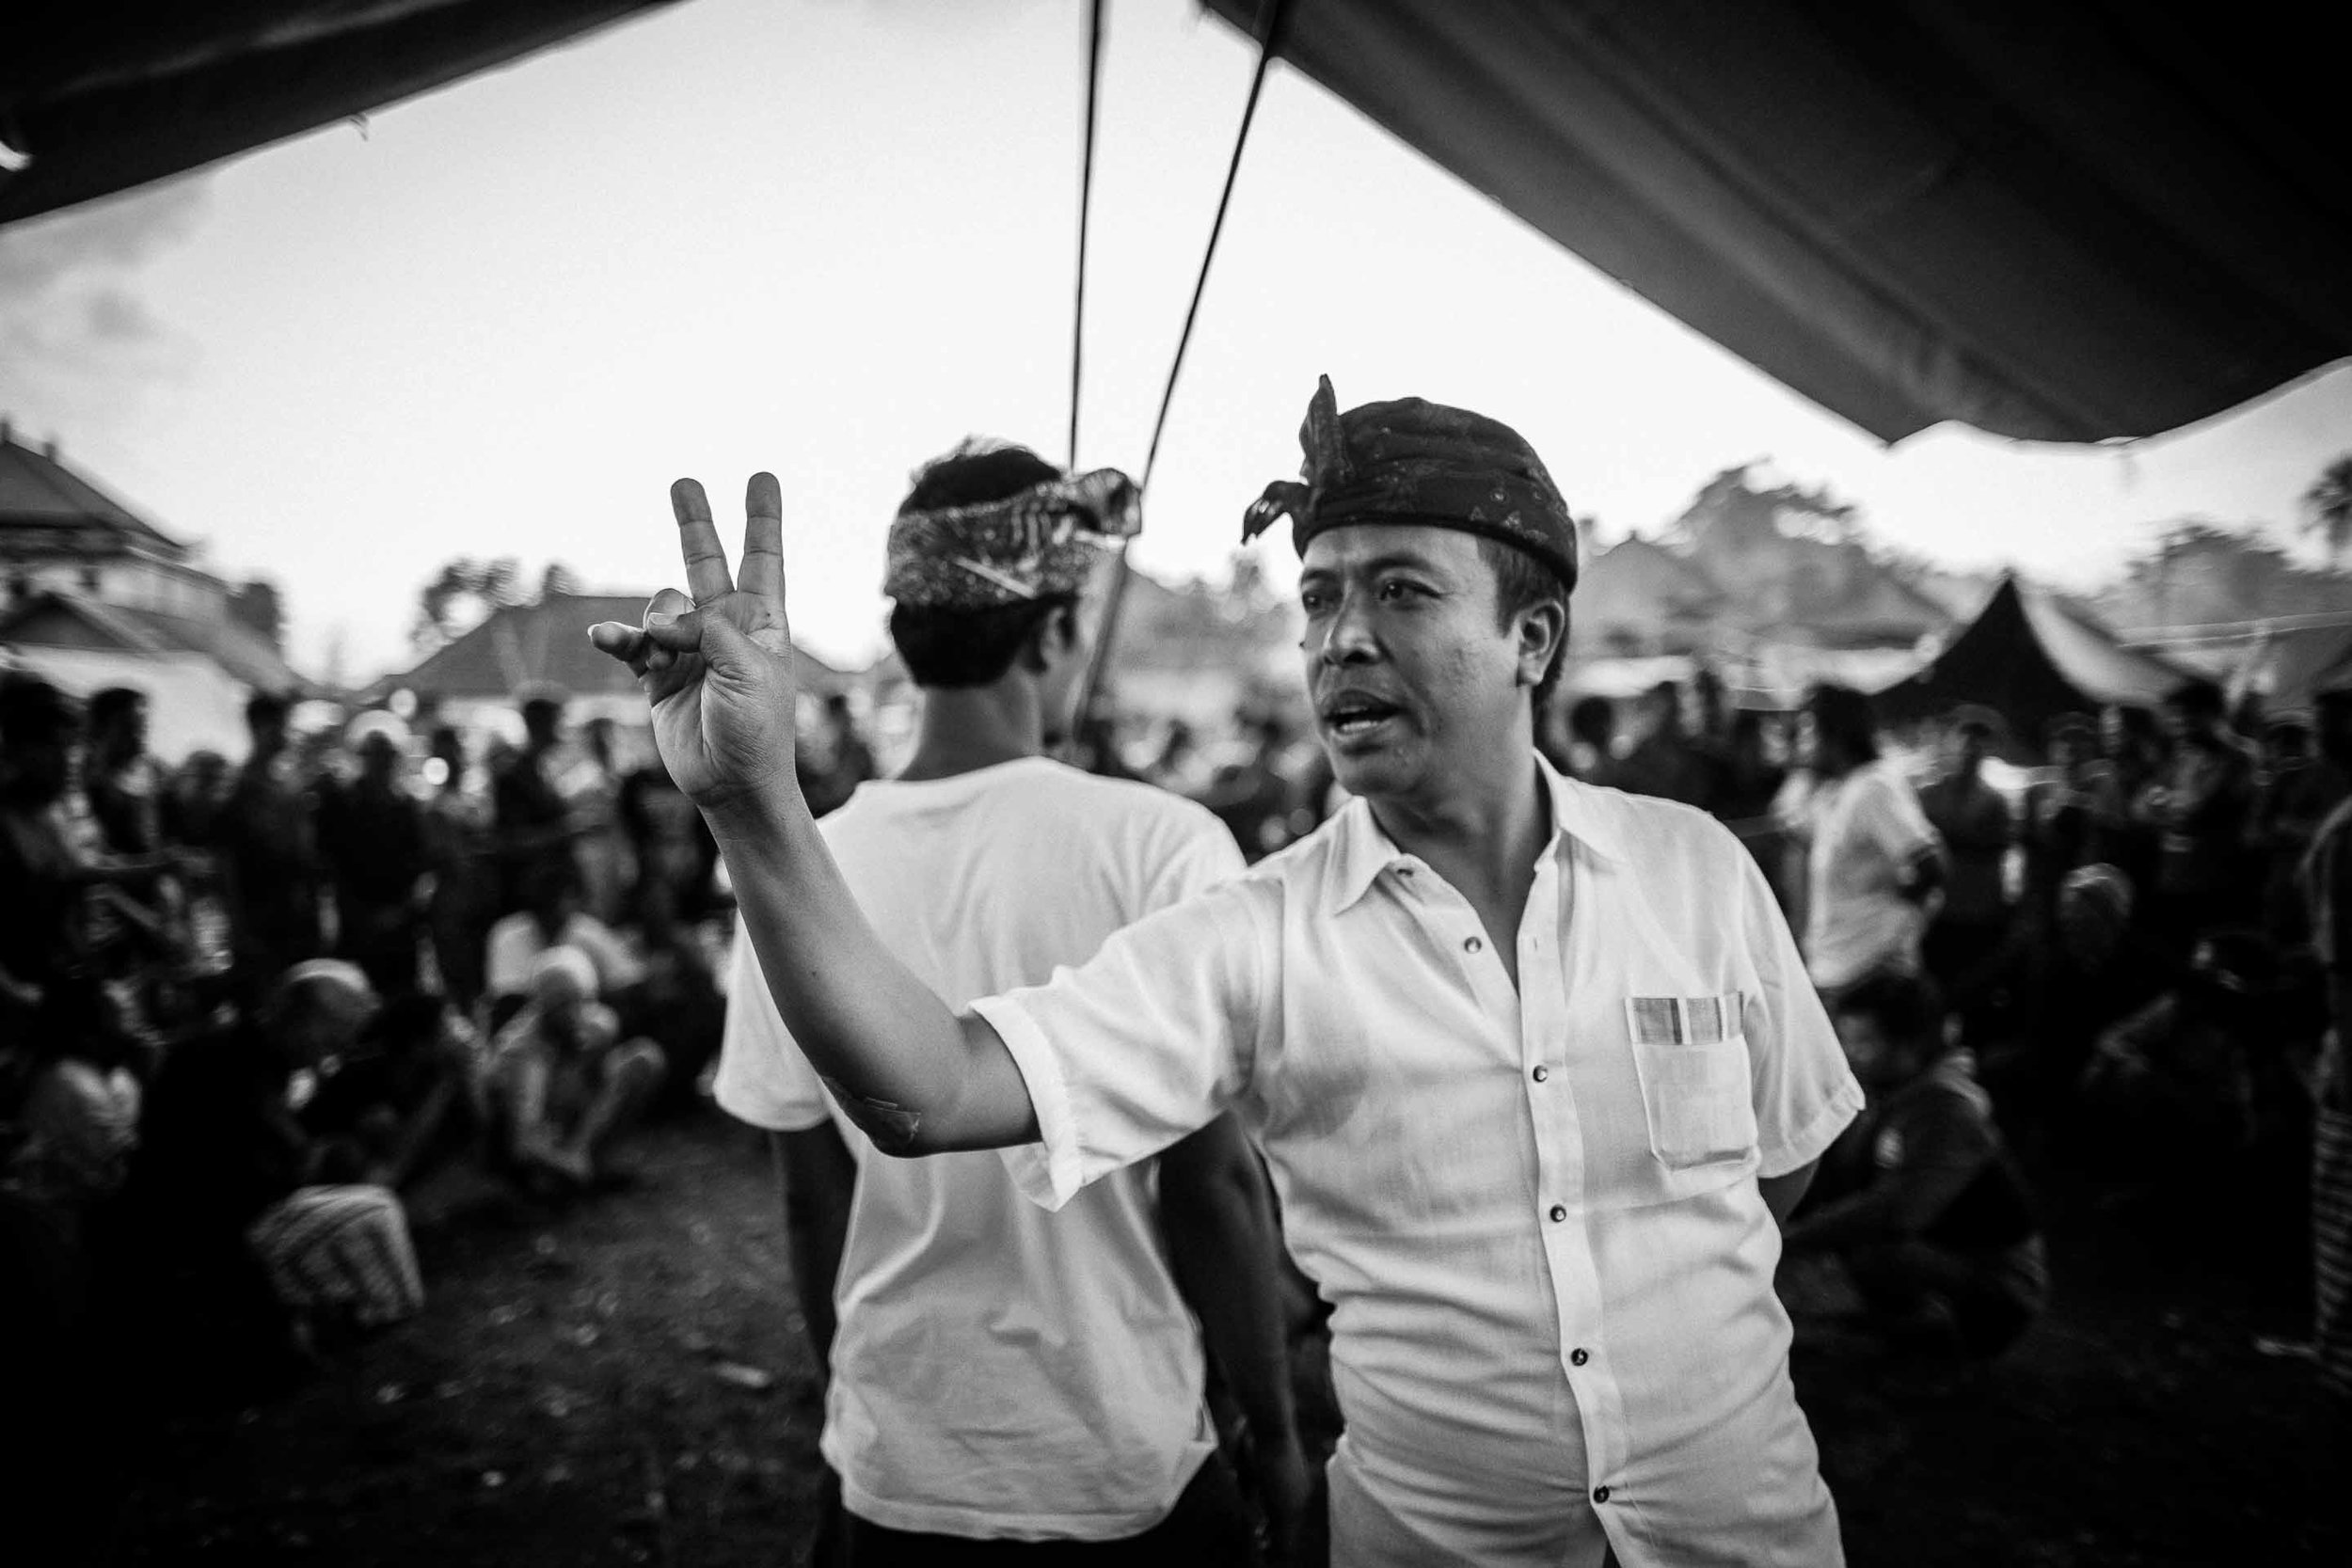 Tajen - Traditional cockfighting in Bali © Gareth Moon 2017